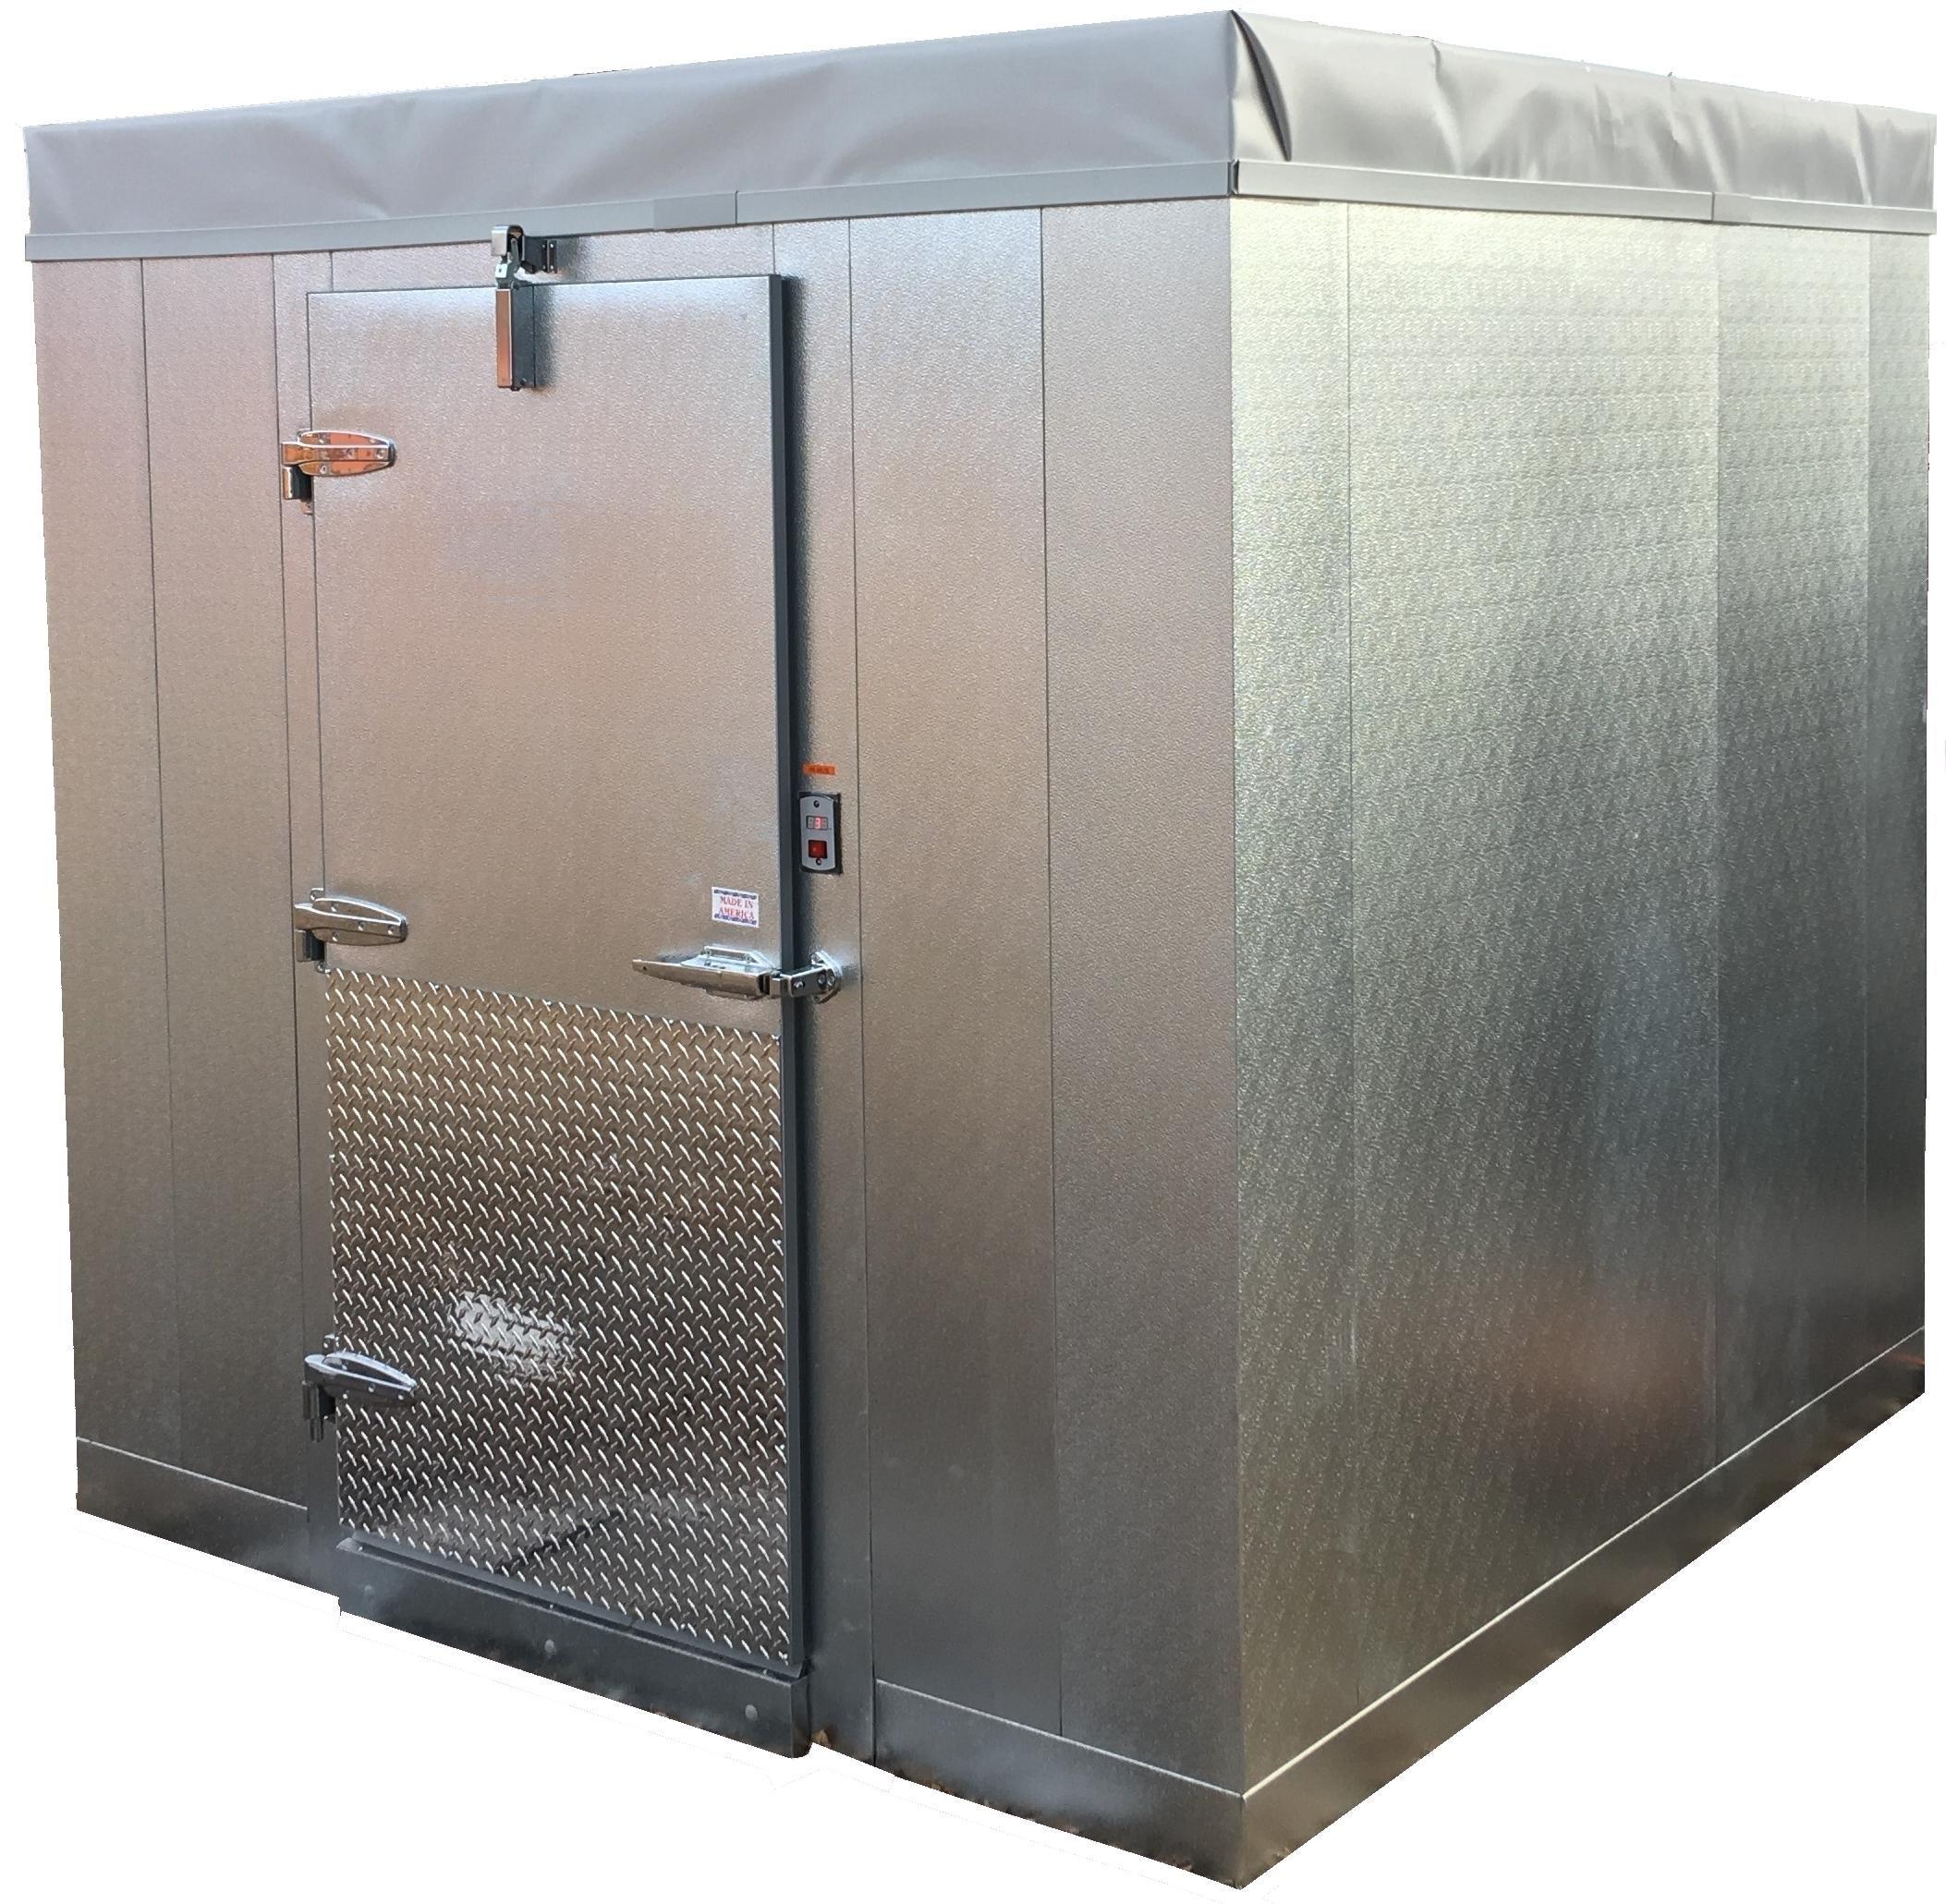 Coolbot Walk In Cooler Front View Walkin Cooler Walk In Freezer Cold Room